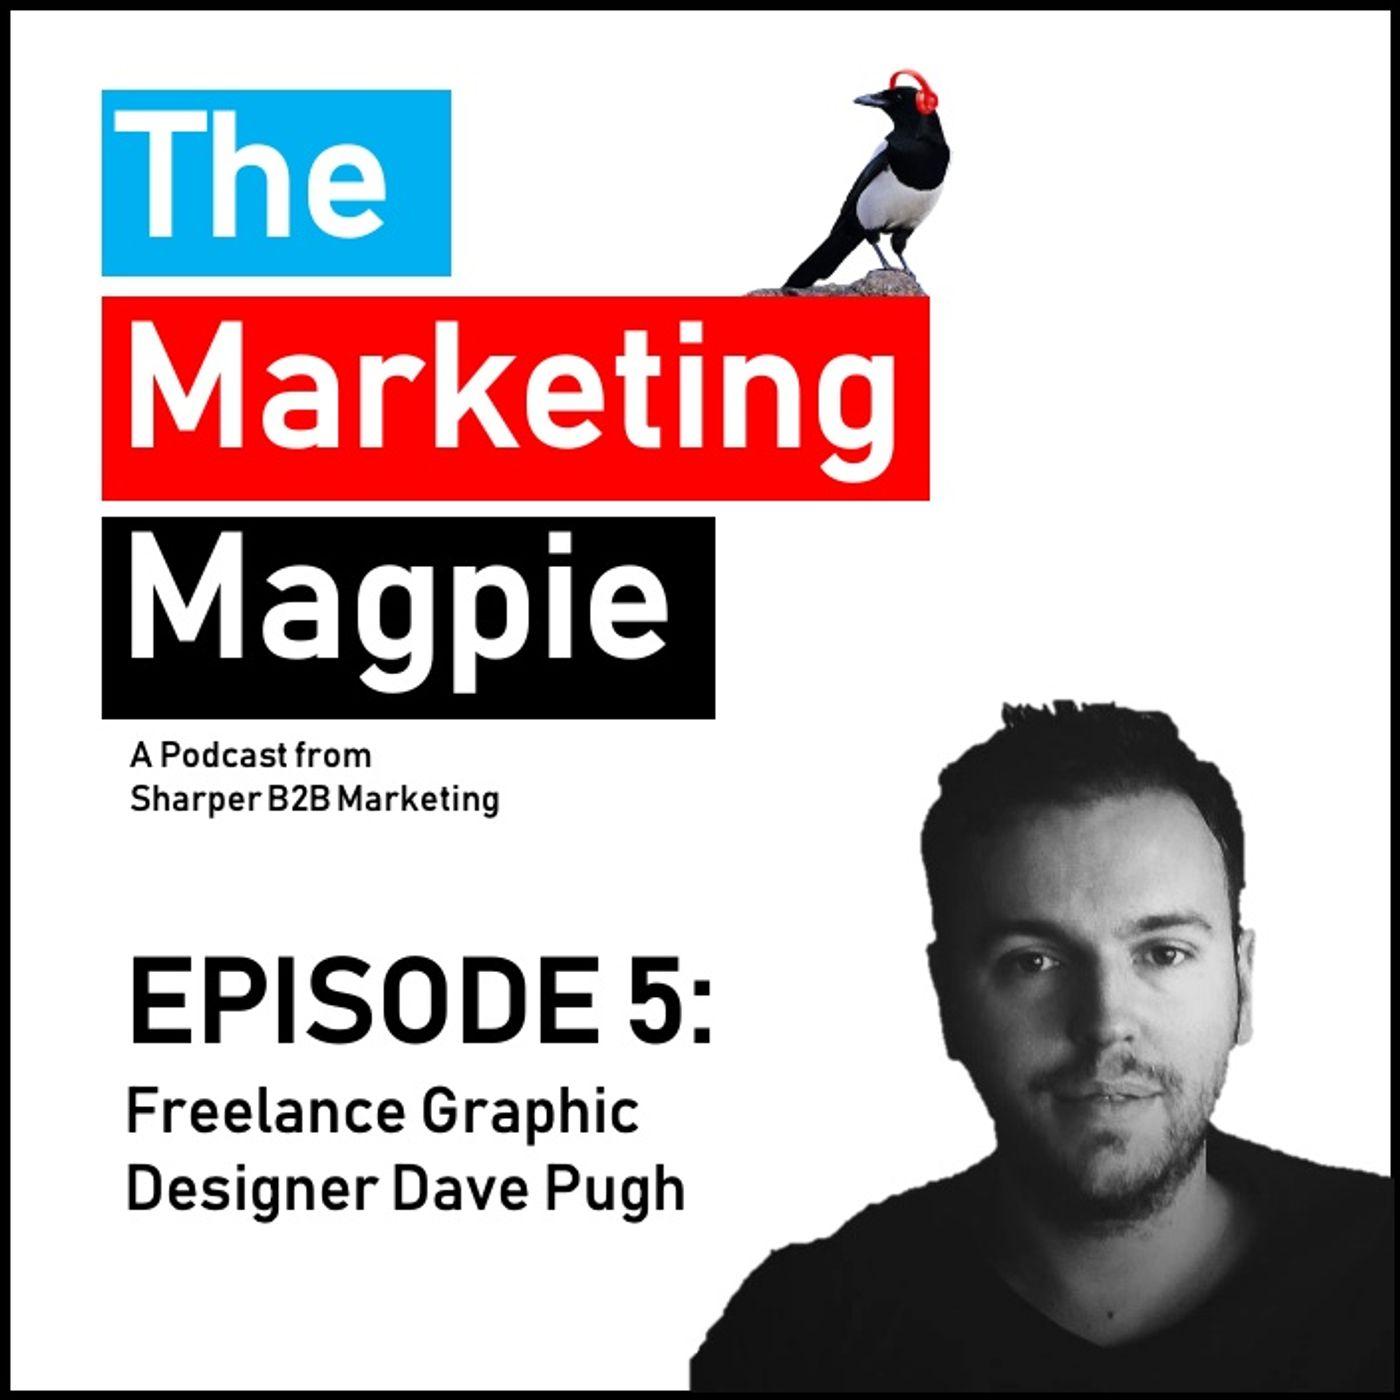 The Marketing Magpie - Episode 5 - Freelance Graphic Designer Dave Pugh